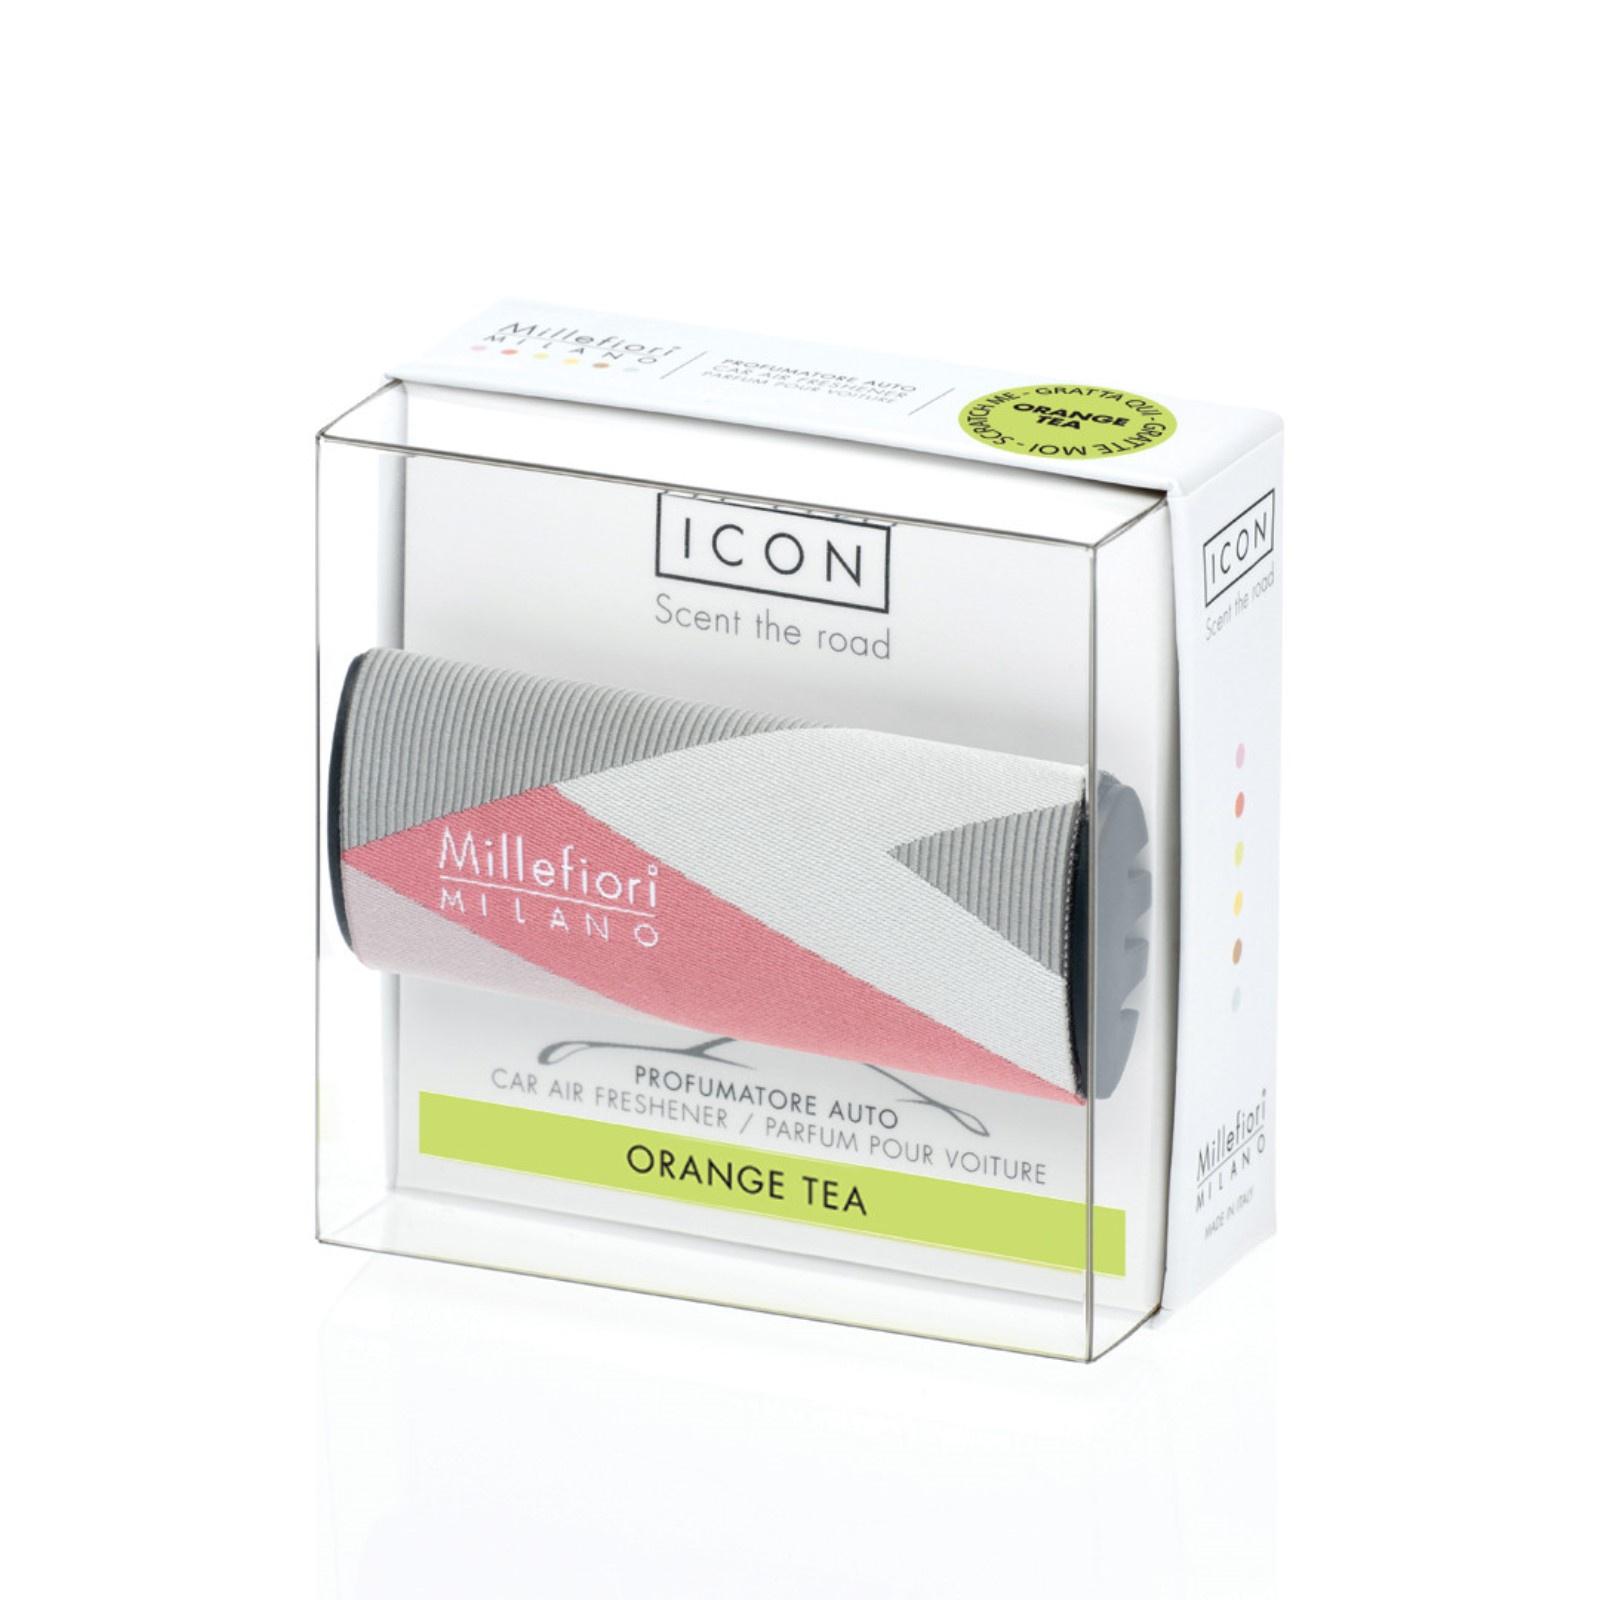 Фото - ICON / Ароматизатор в авто Текстильная геометрия Апельсиновый чай CAR AIR FRESHENER ICON TEXTILE GEOMETRIC - ORANGE TEA авто